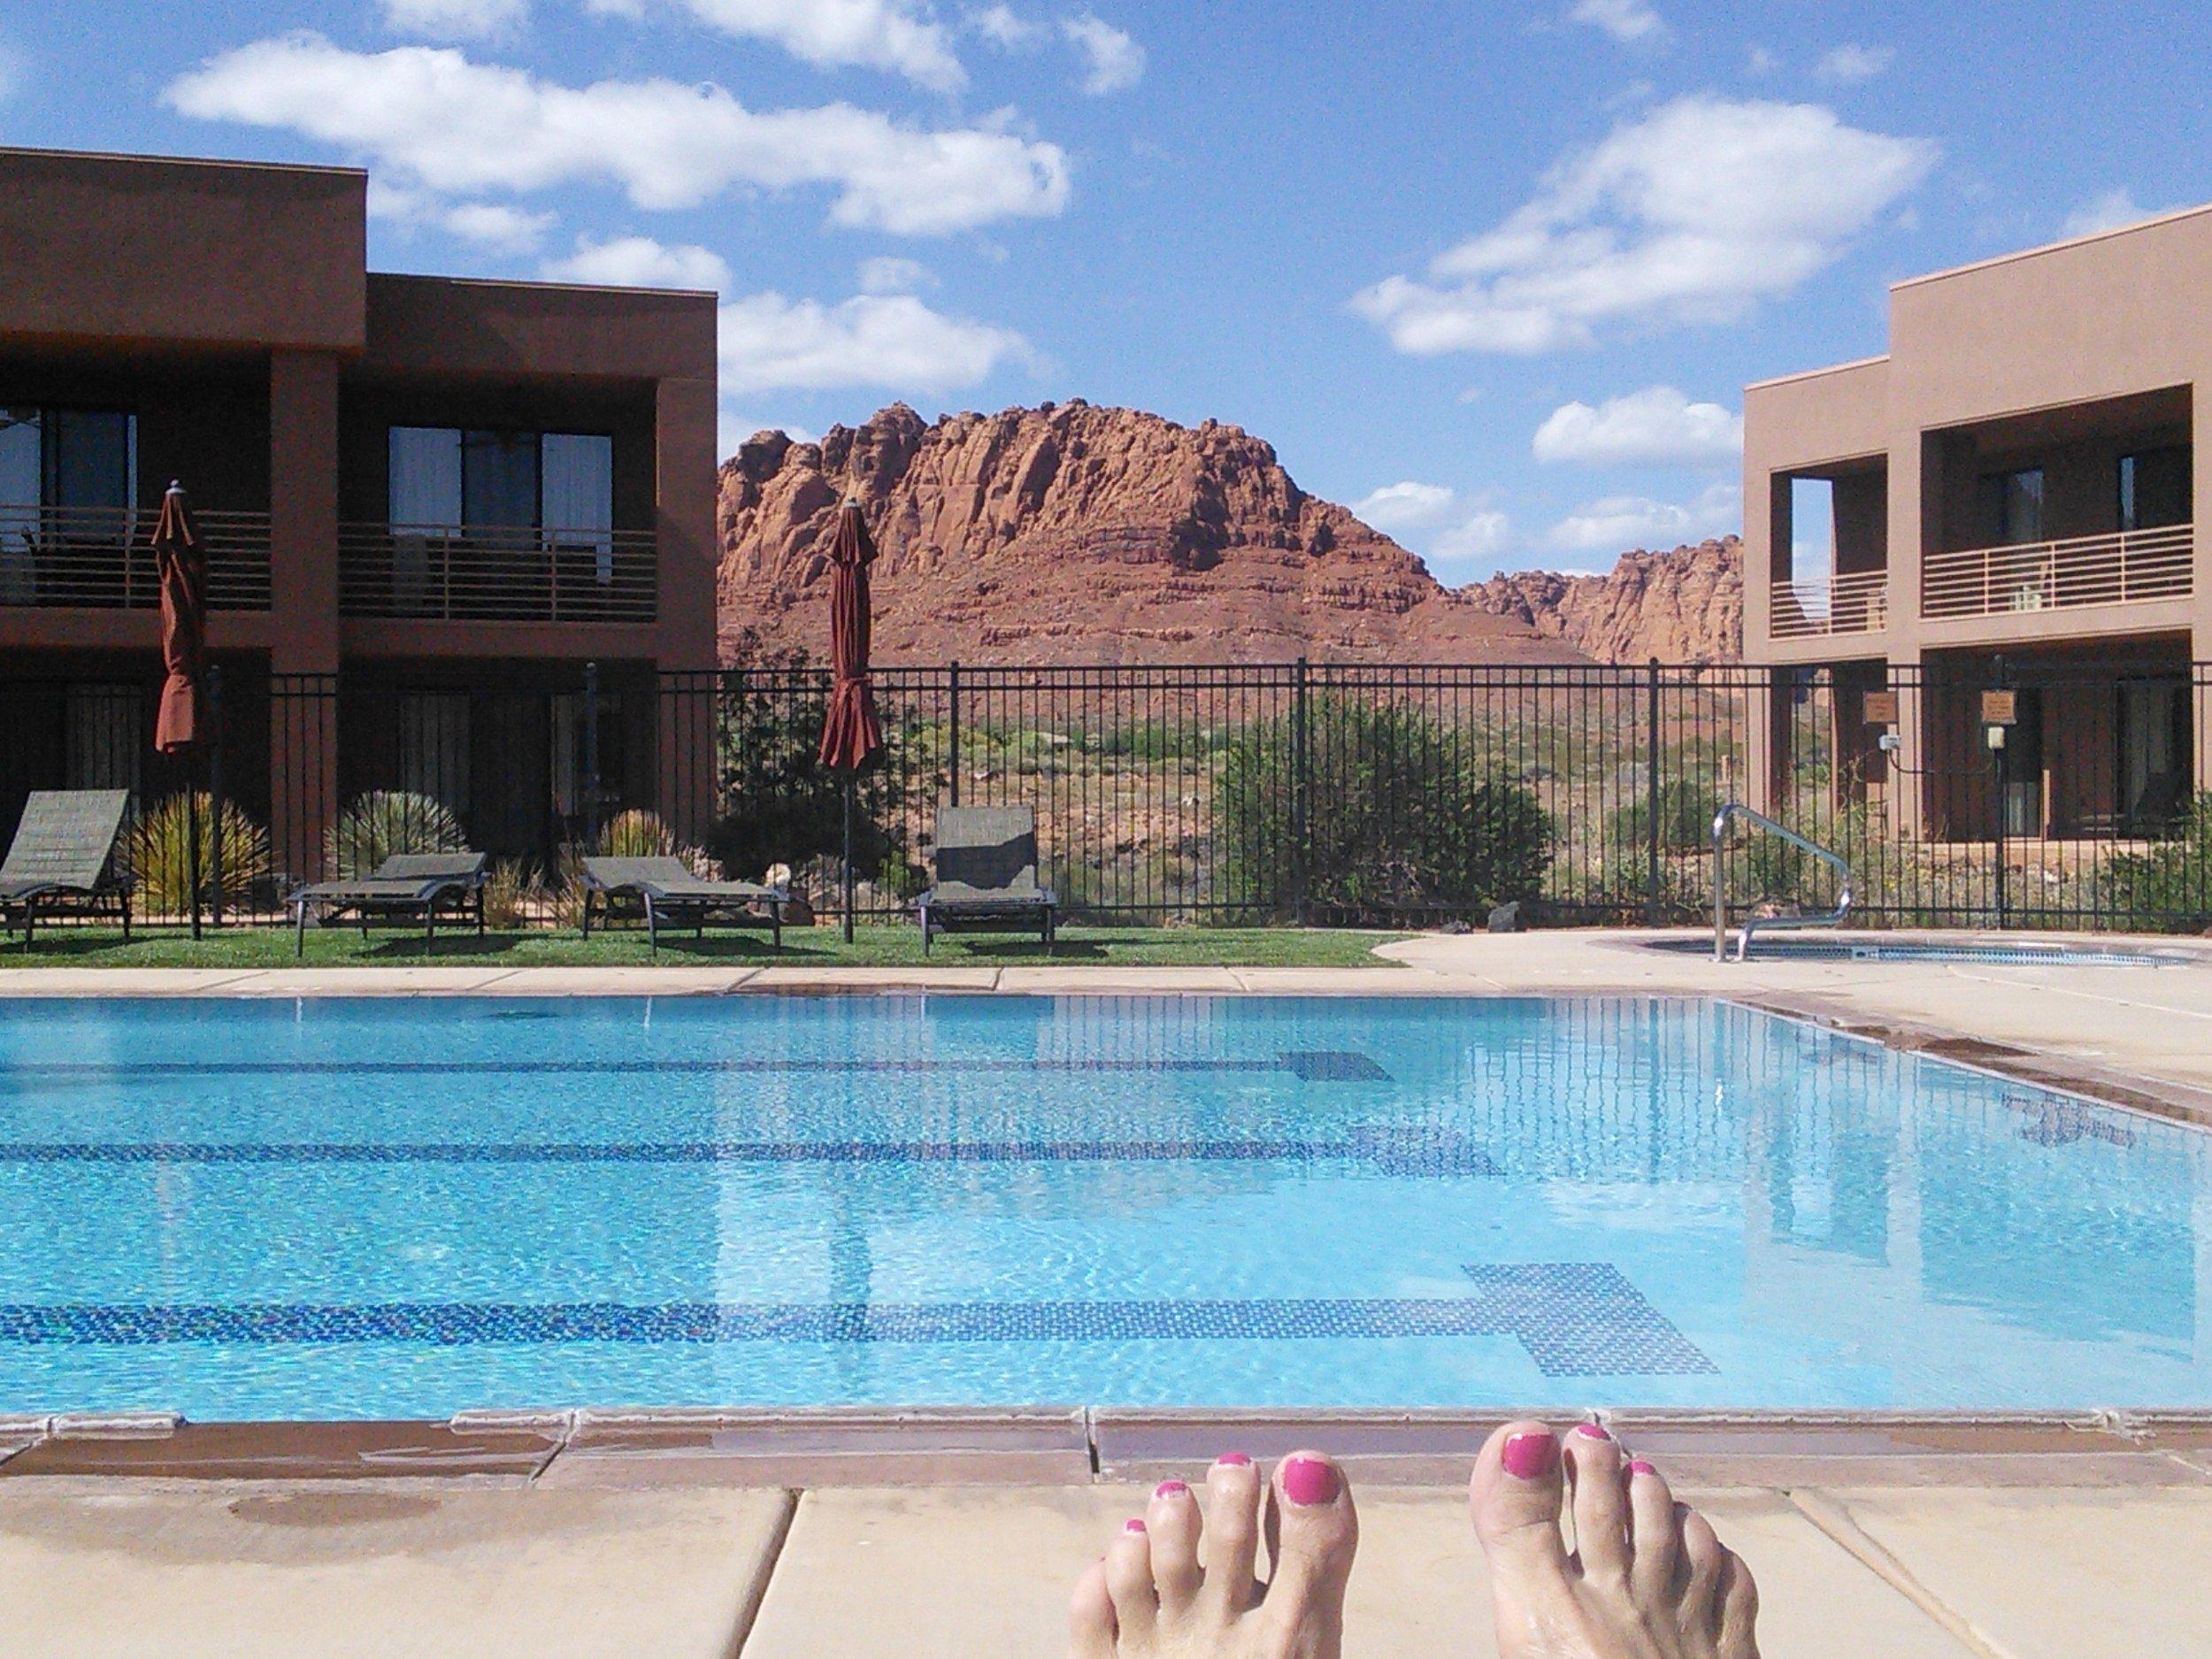 wellness vacation, jeri Donovan, fitness vacation, red mountain resort